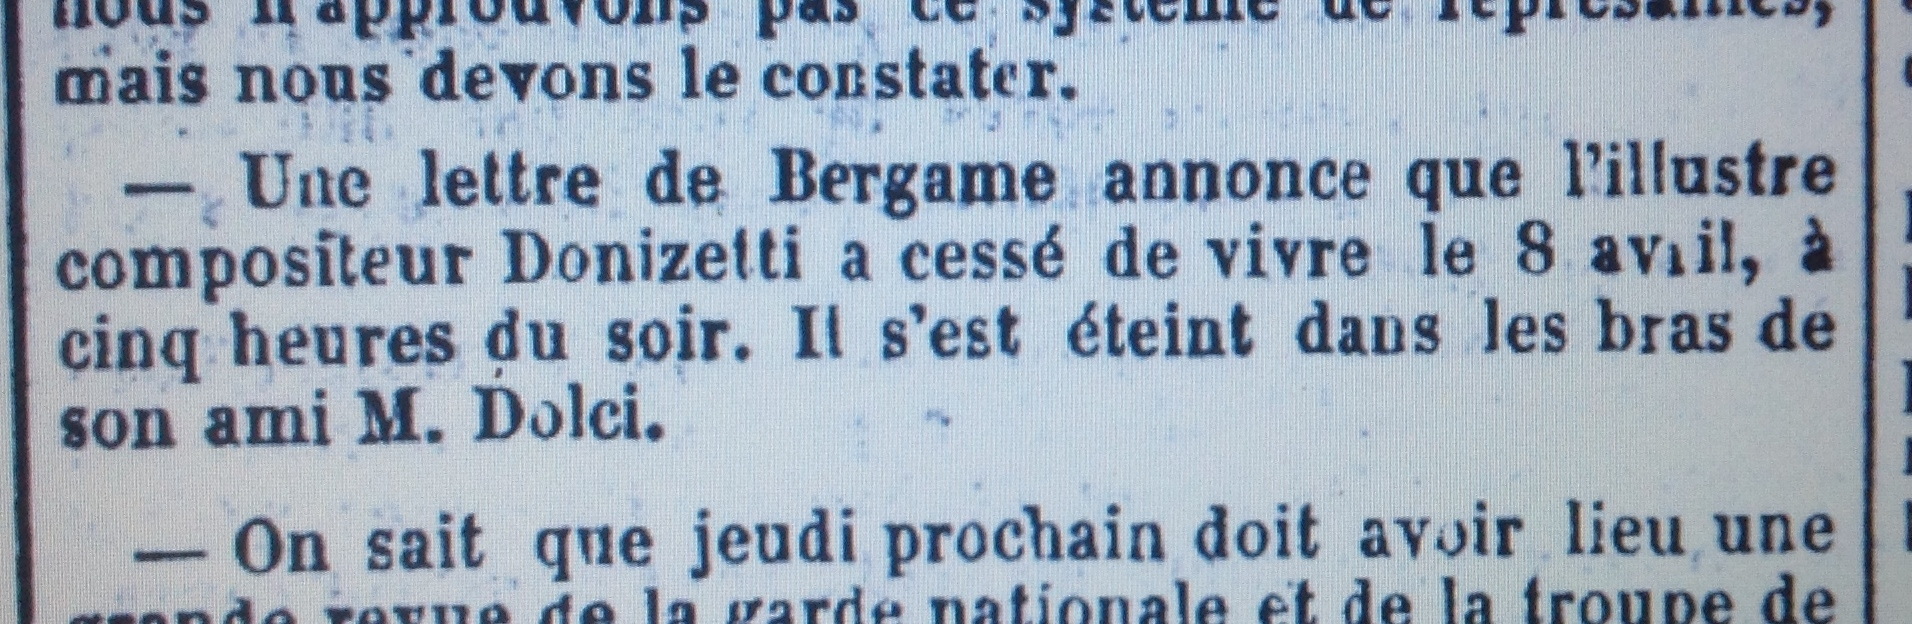 donis tod, jdd 18 4 1848